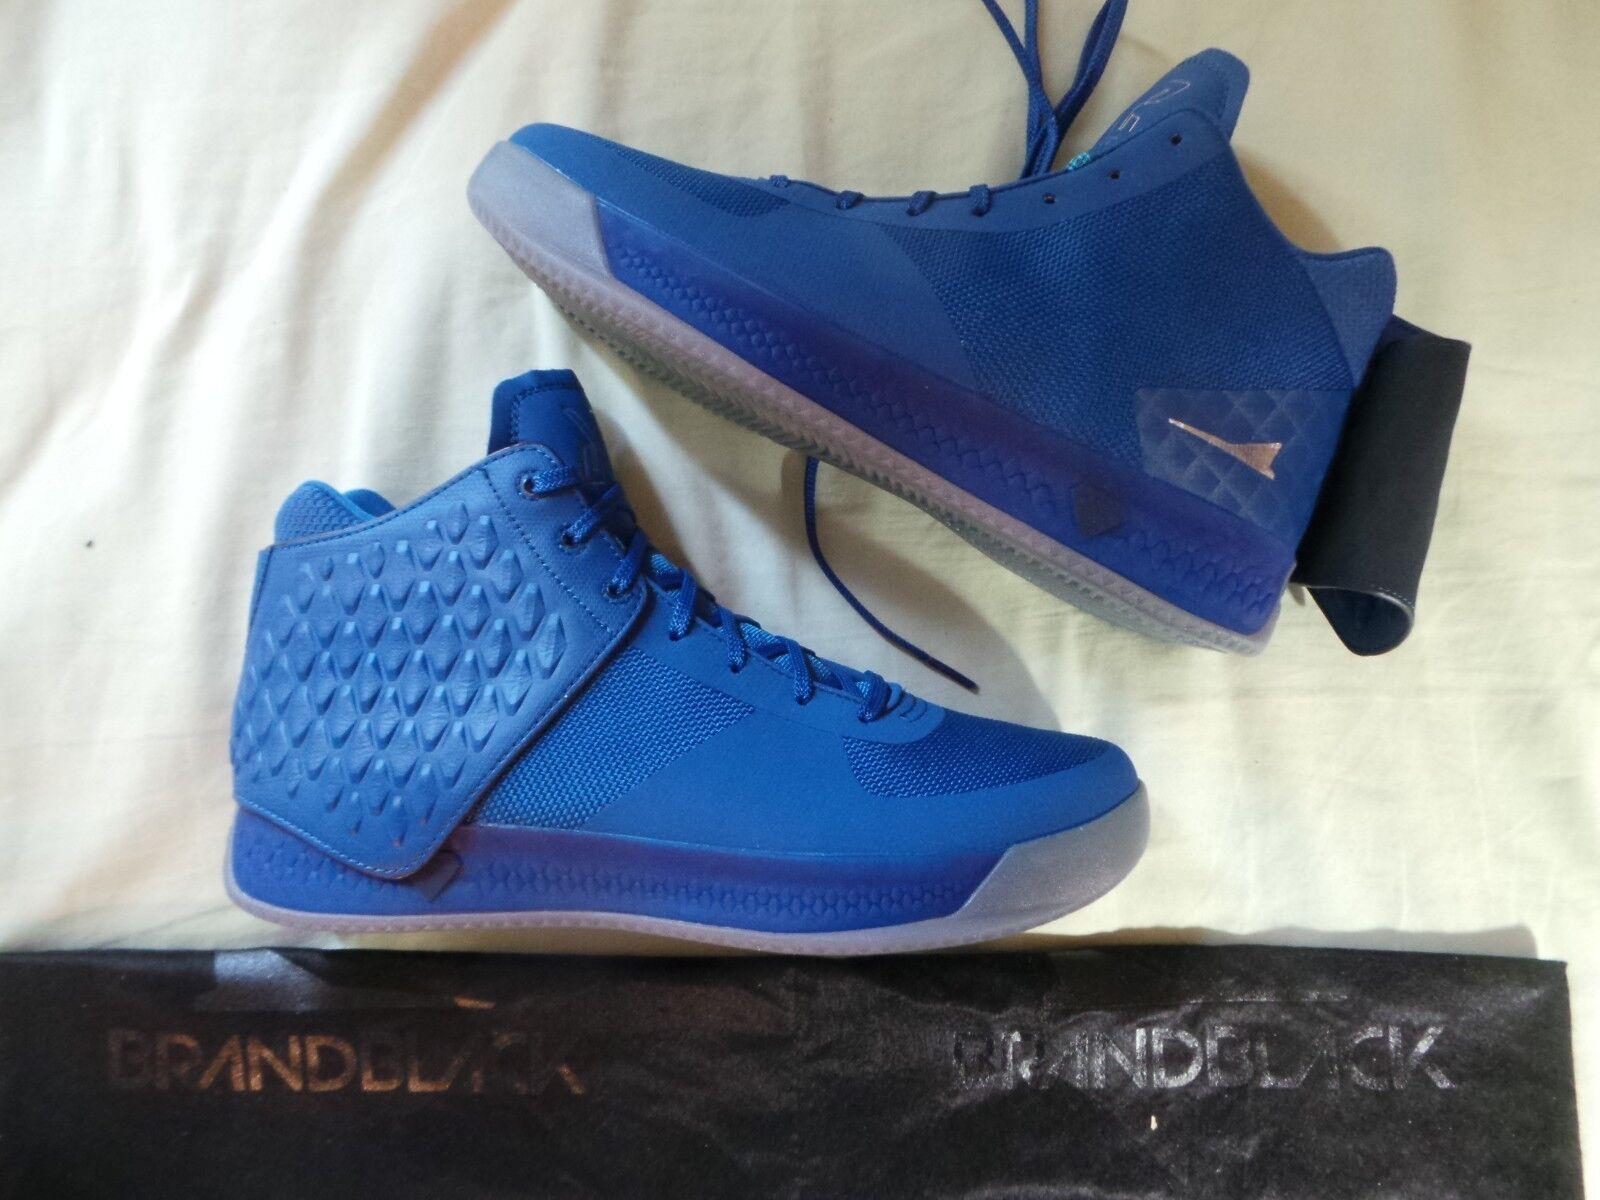 22a8d245a6f1 Brand Black BrandBlack J Crossover 3 Jamal Crawford 160 COMFY COMFY COMFY  blue size 10.5 DS